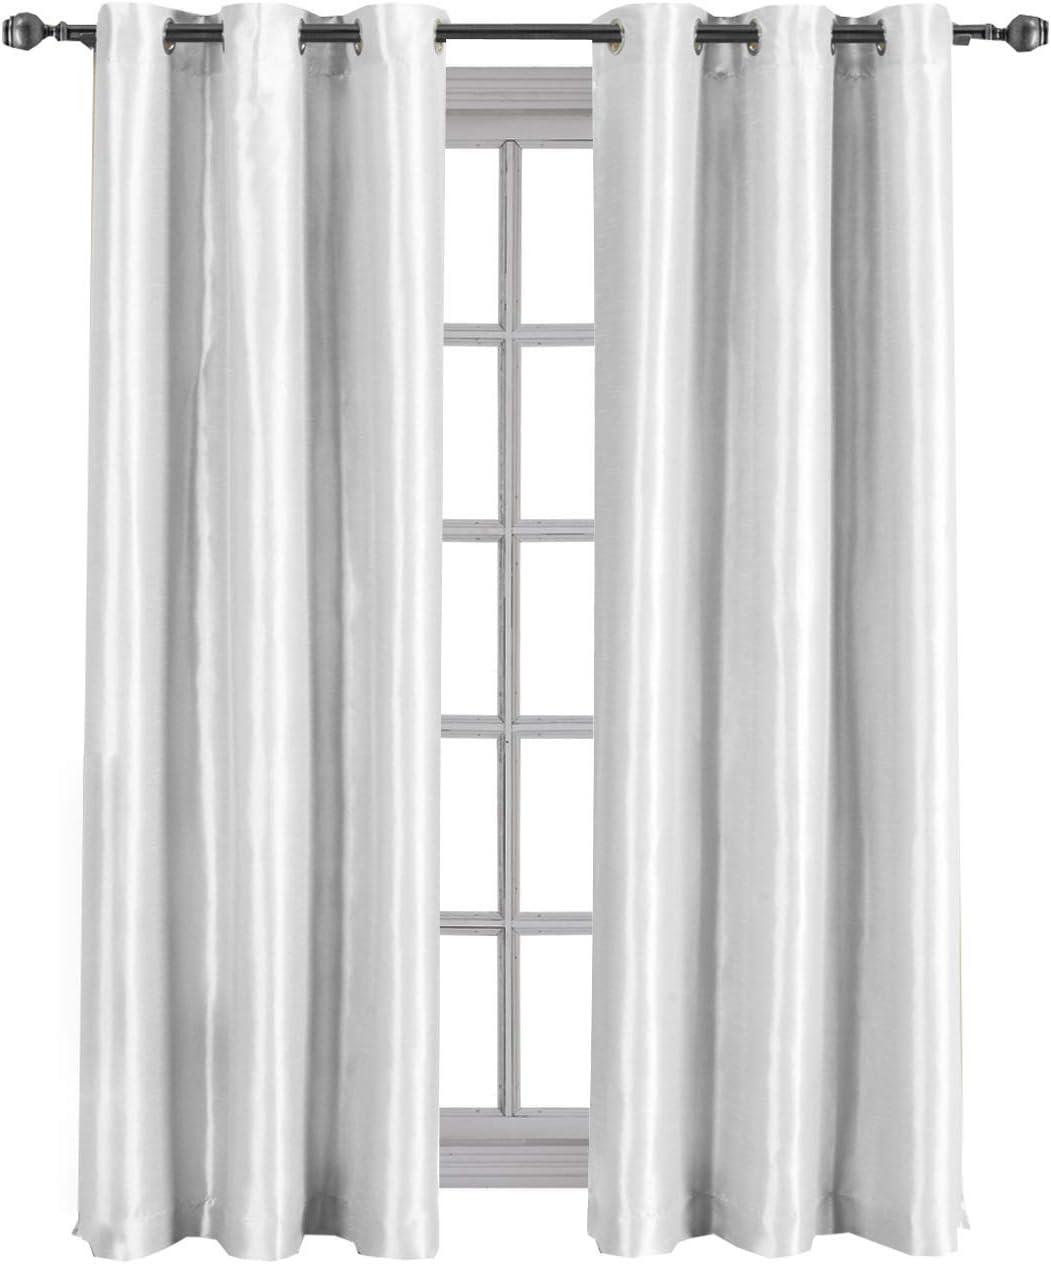 Calloway Mills 180031830R Armada Circle Monogram Doormat, 18 x 30 Letter R